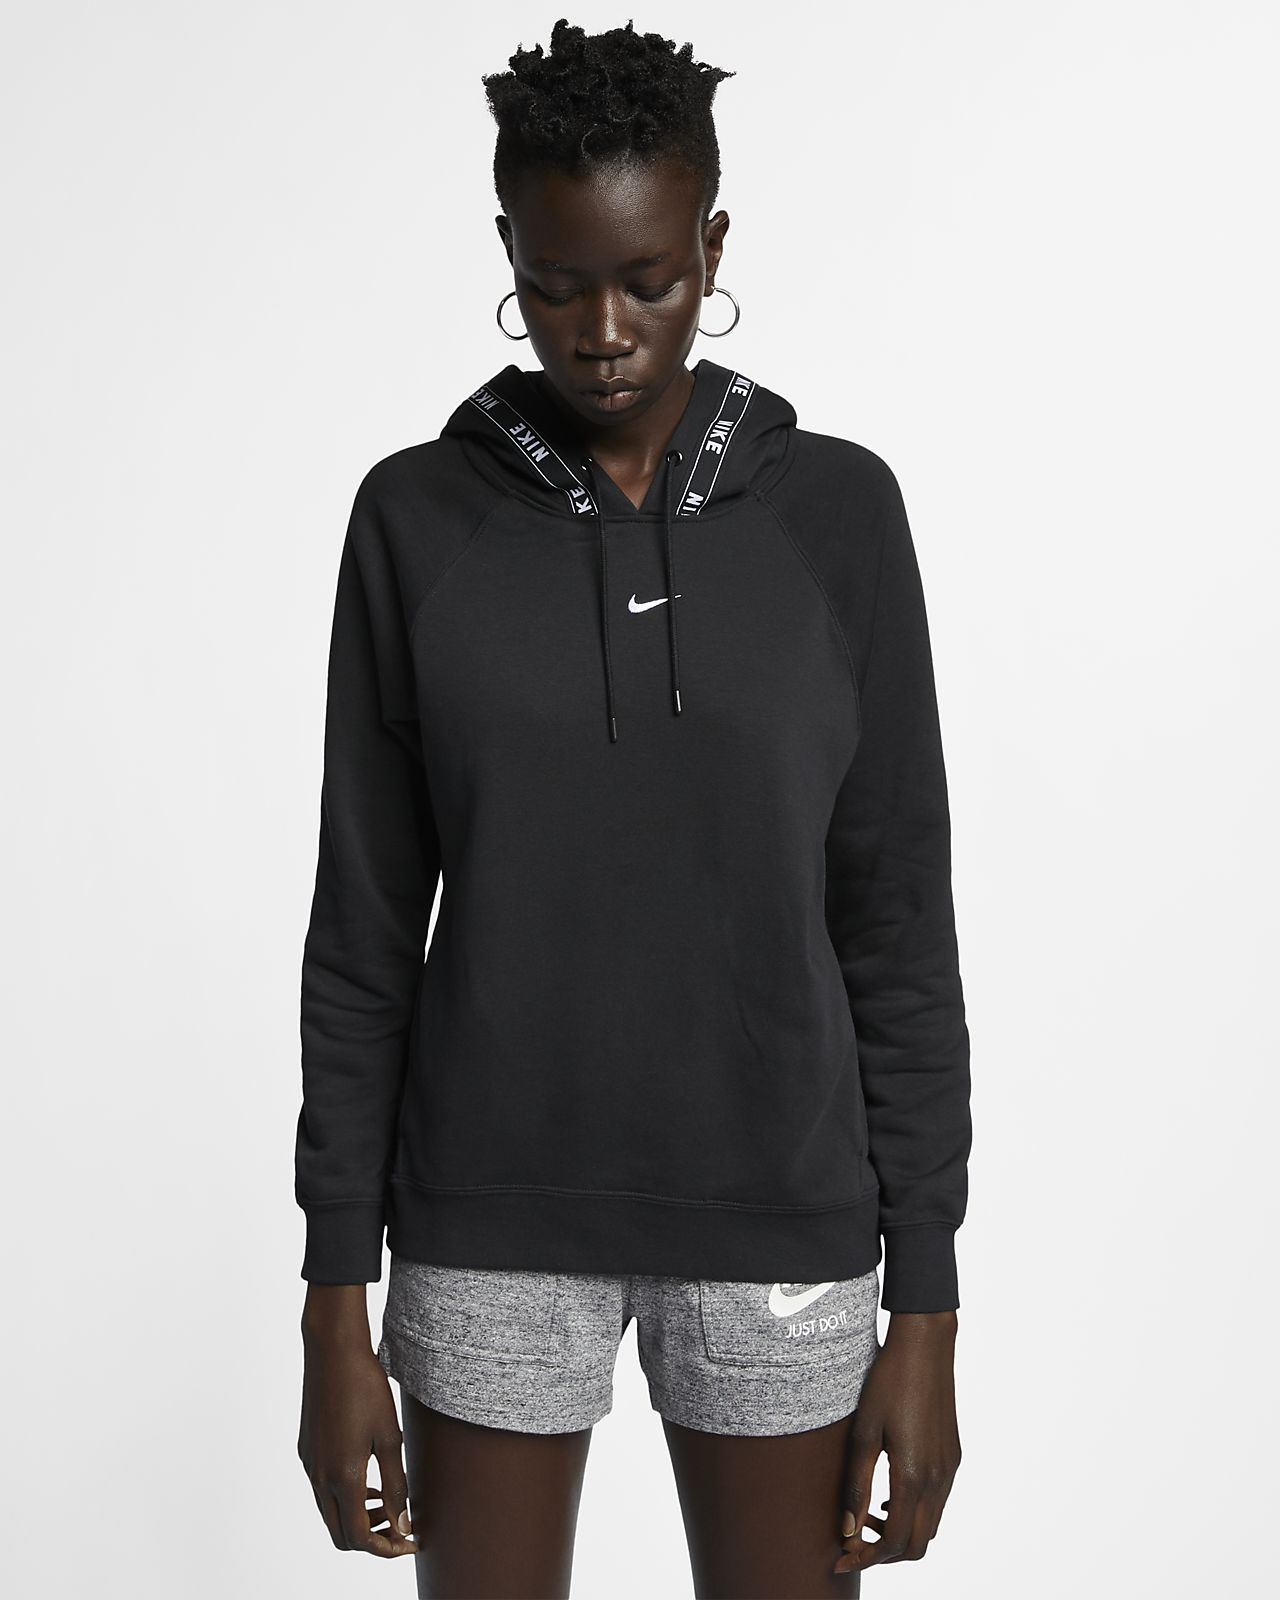 53b4b23481 Nike Sportswear emblémás, kapucnis női pulóver. Nike.com HU